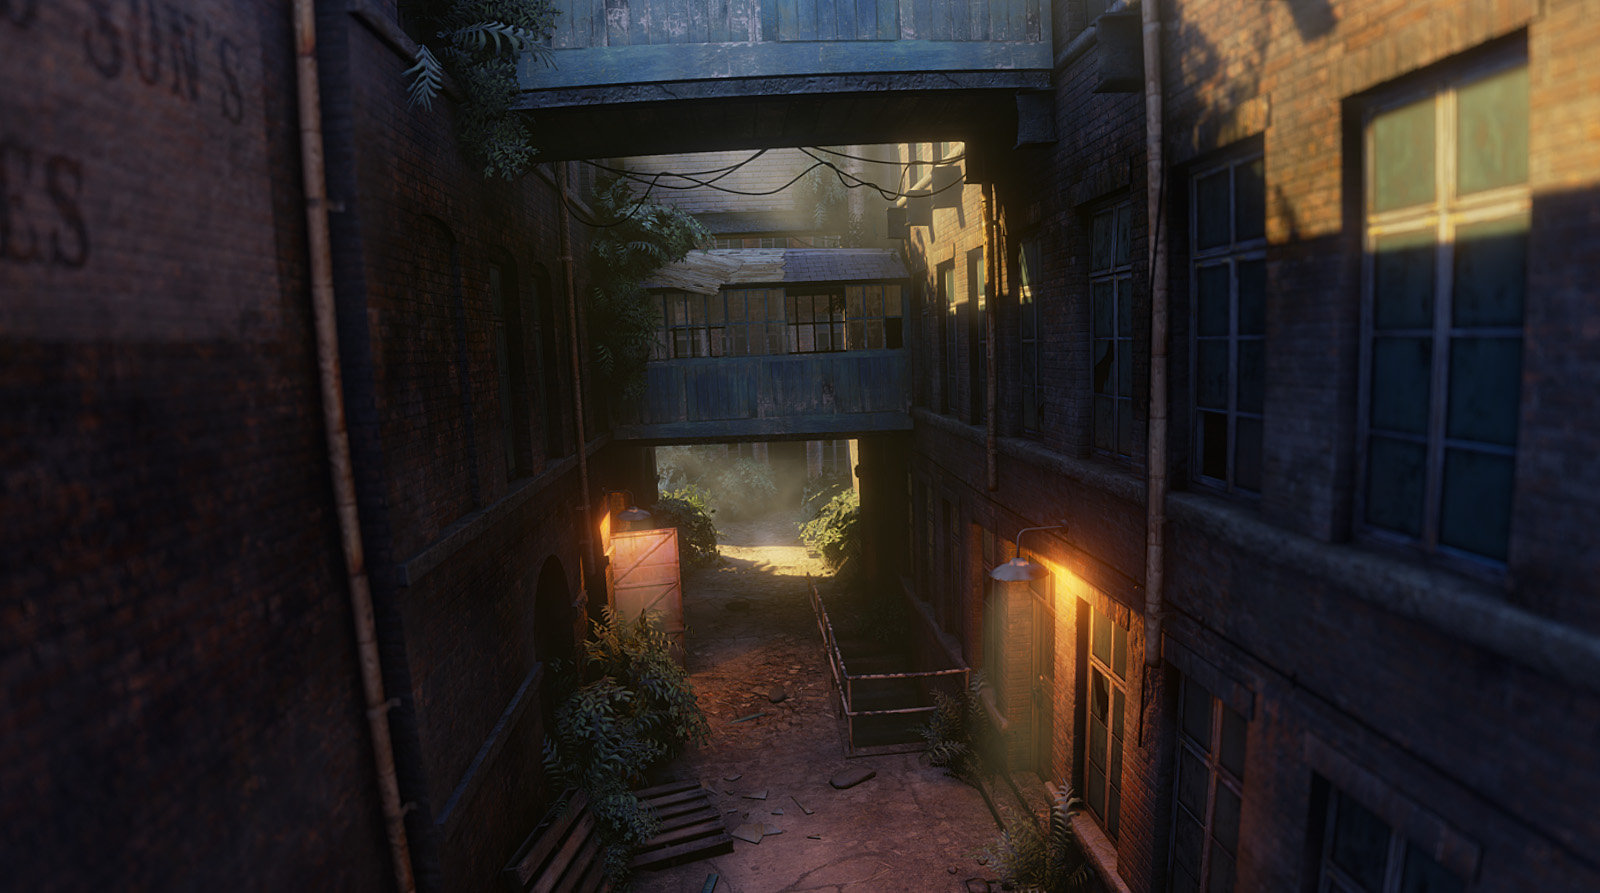 Jeff severson alley 04